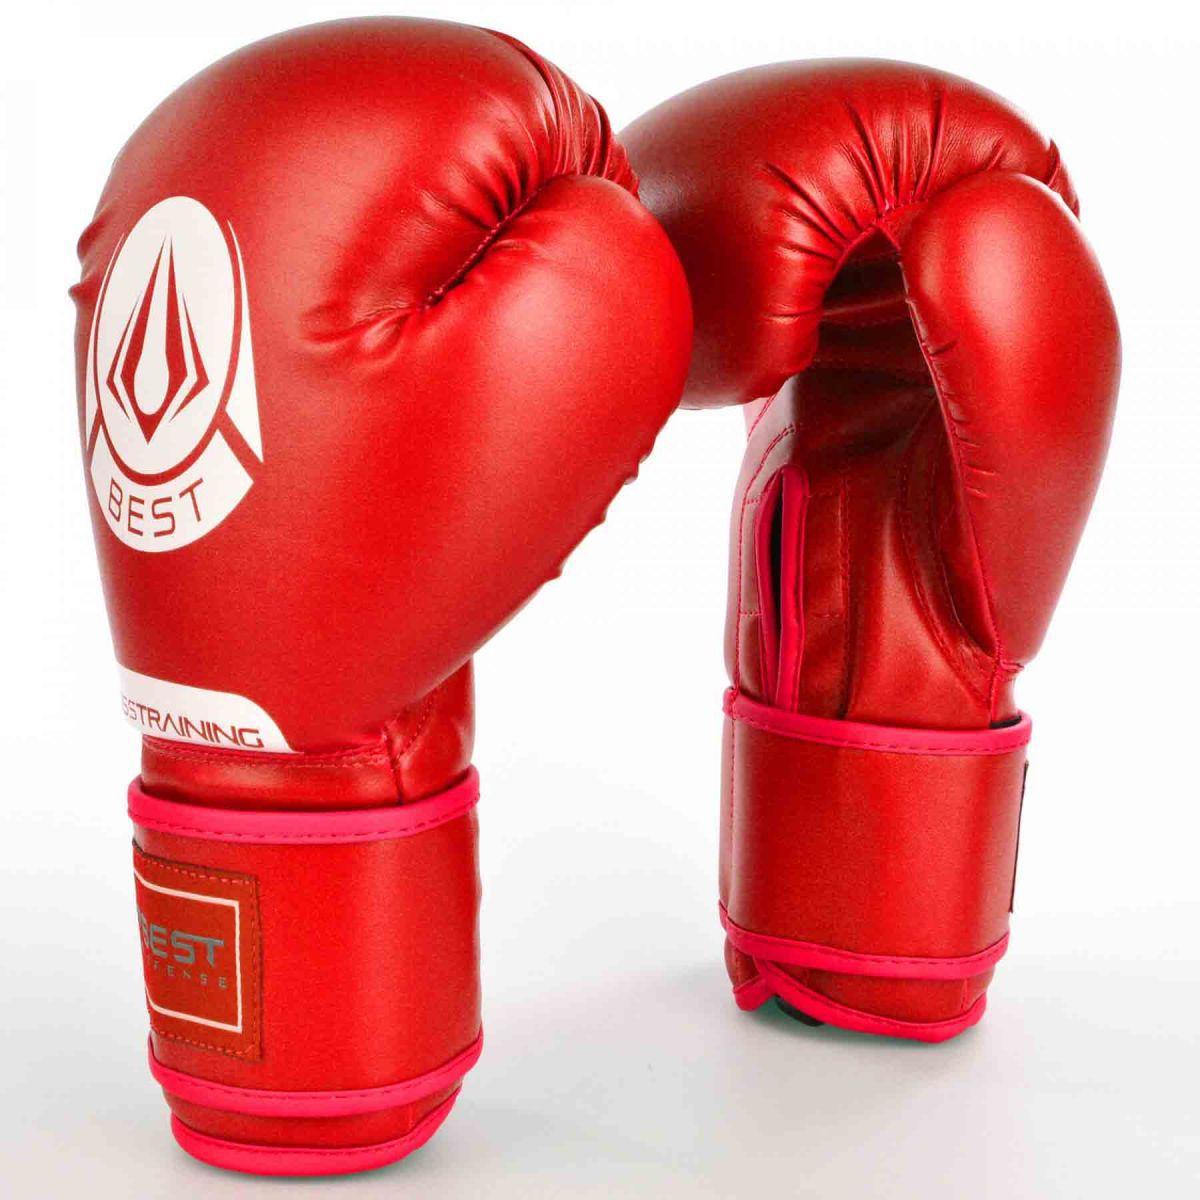 Luvas Boxe / Muay Thai - Cross Trainning- Best Defense - Vermelho - 10/12/14OZ .